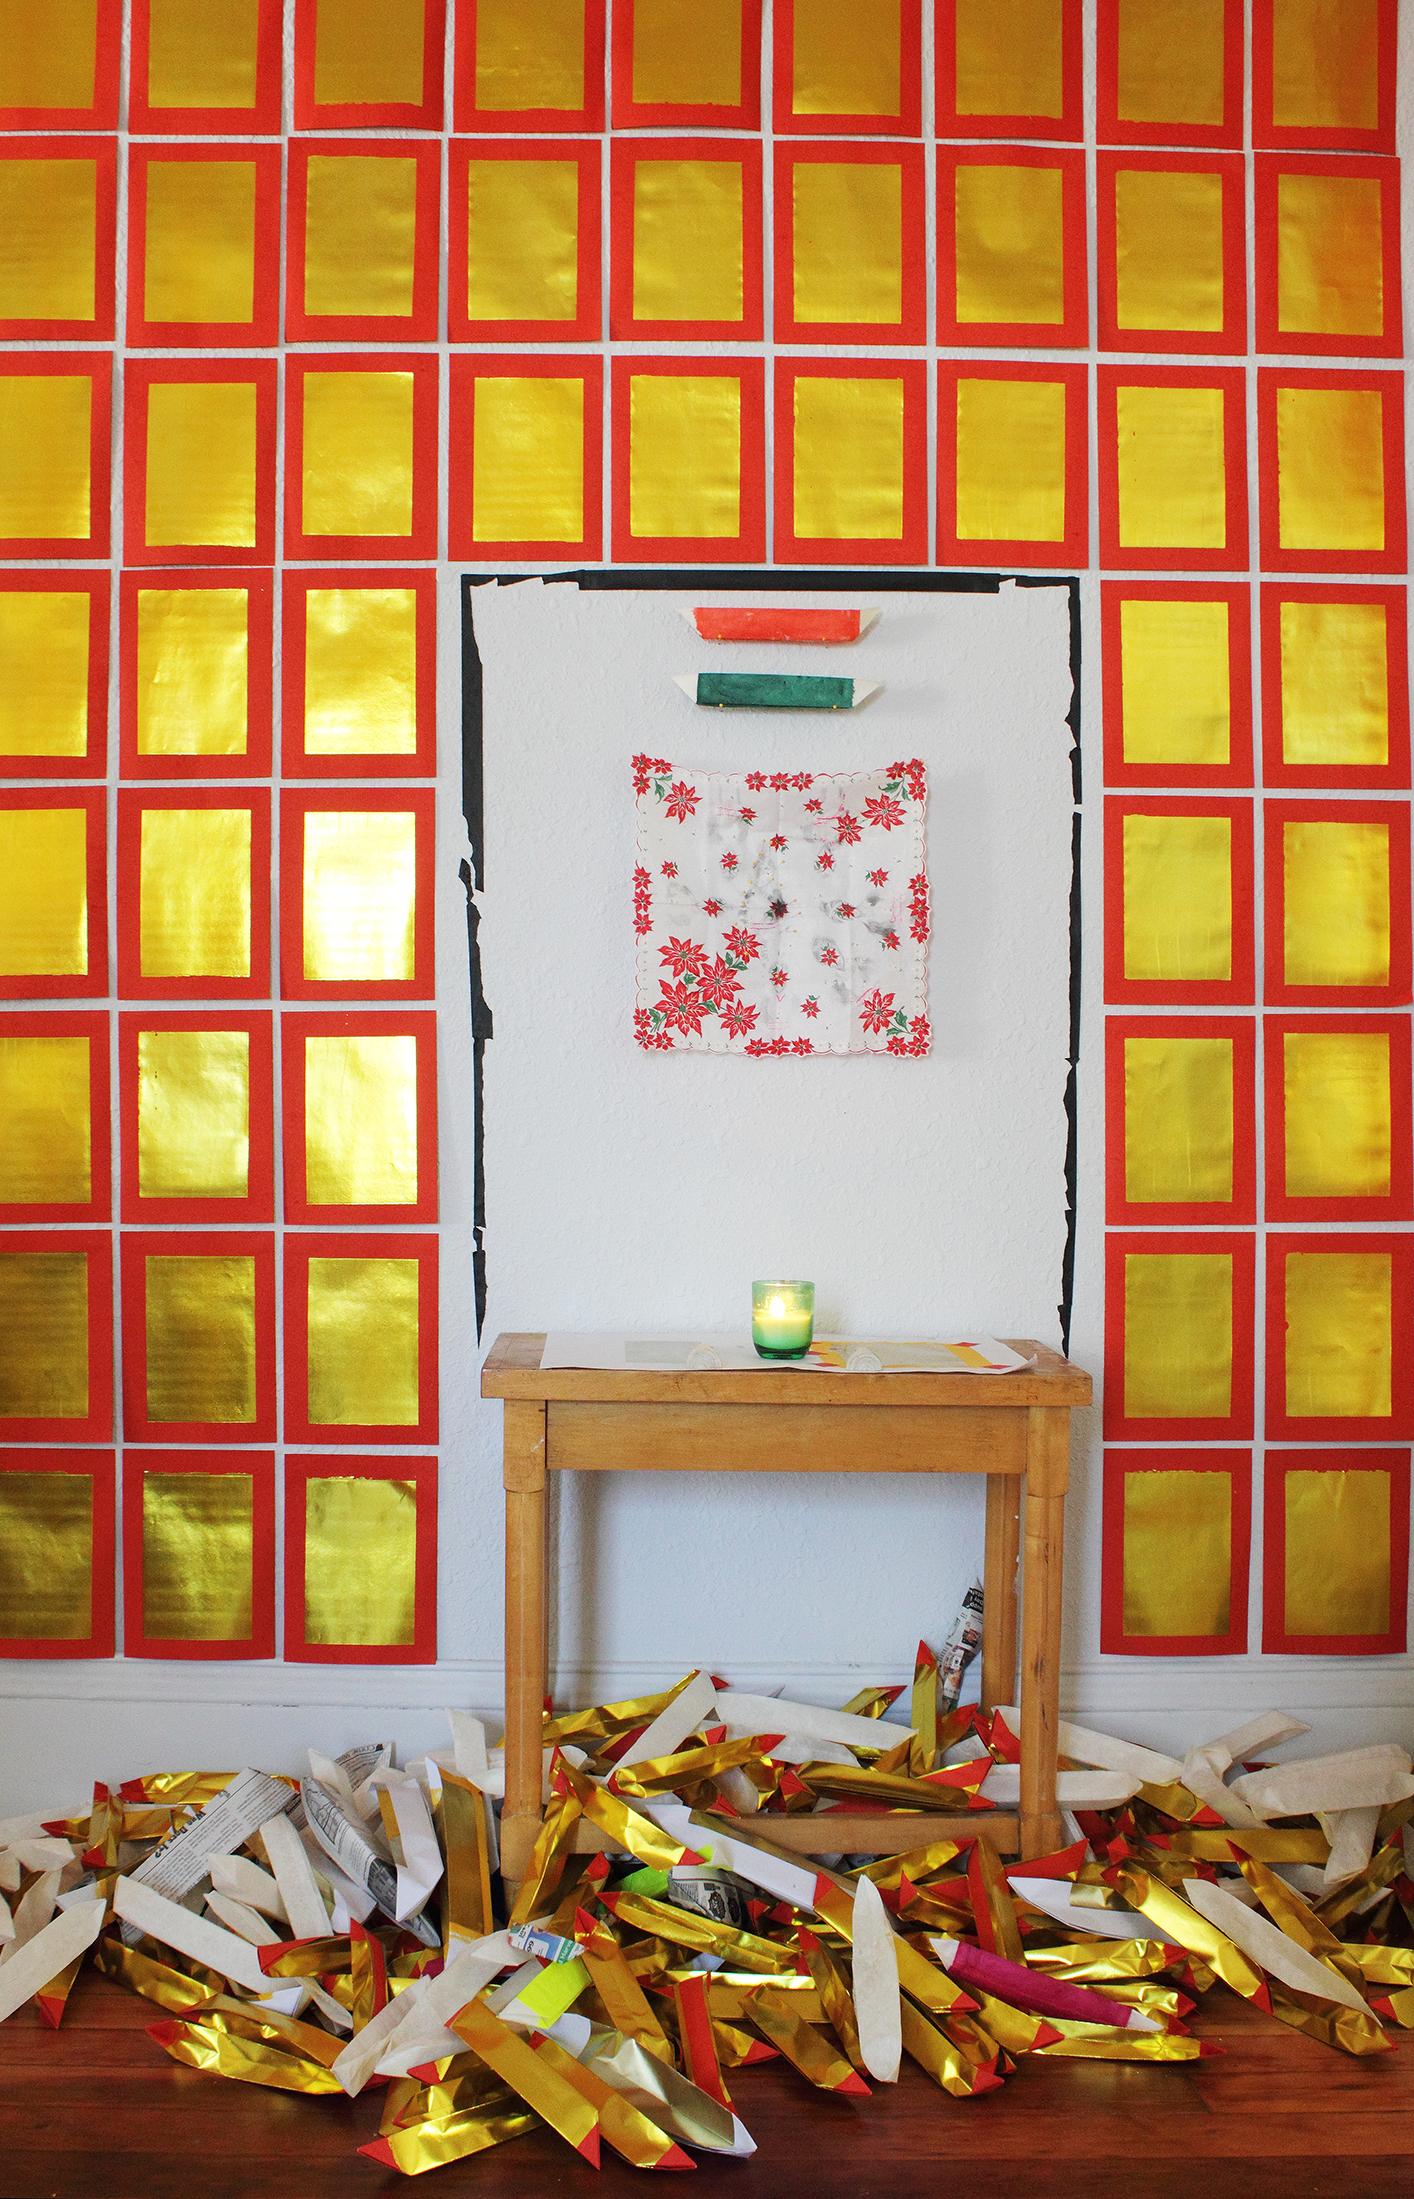 Tsev Hmoob #1, Hmong house #1